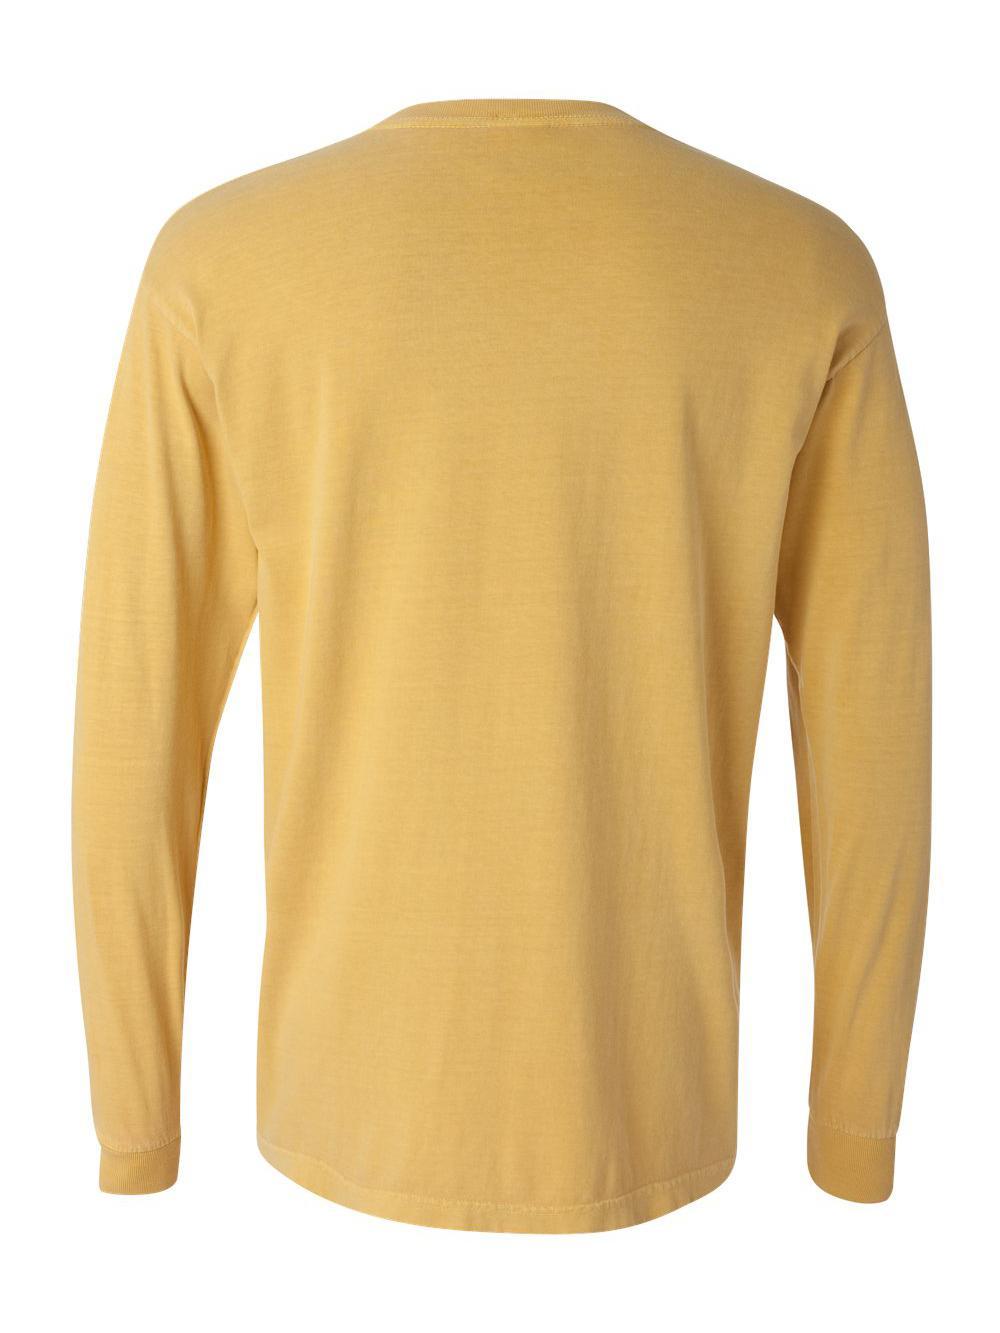 Comfort-Colors-Garment-Dyed-Heavyweight-Ringspun-Long-Sleeve-T-Shirt-6014 thumbnail 55